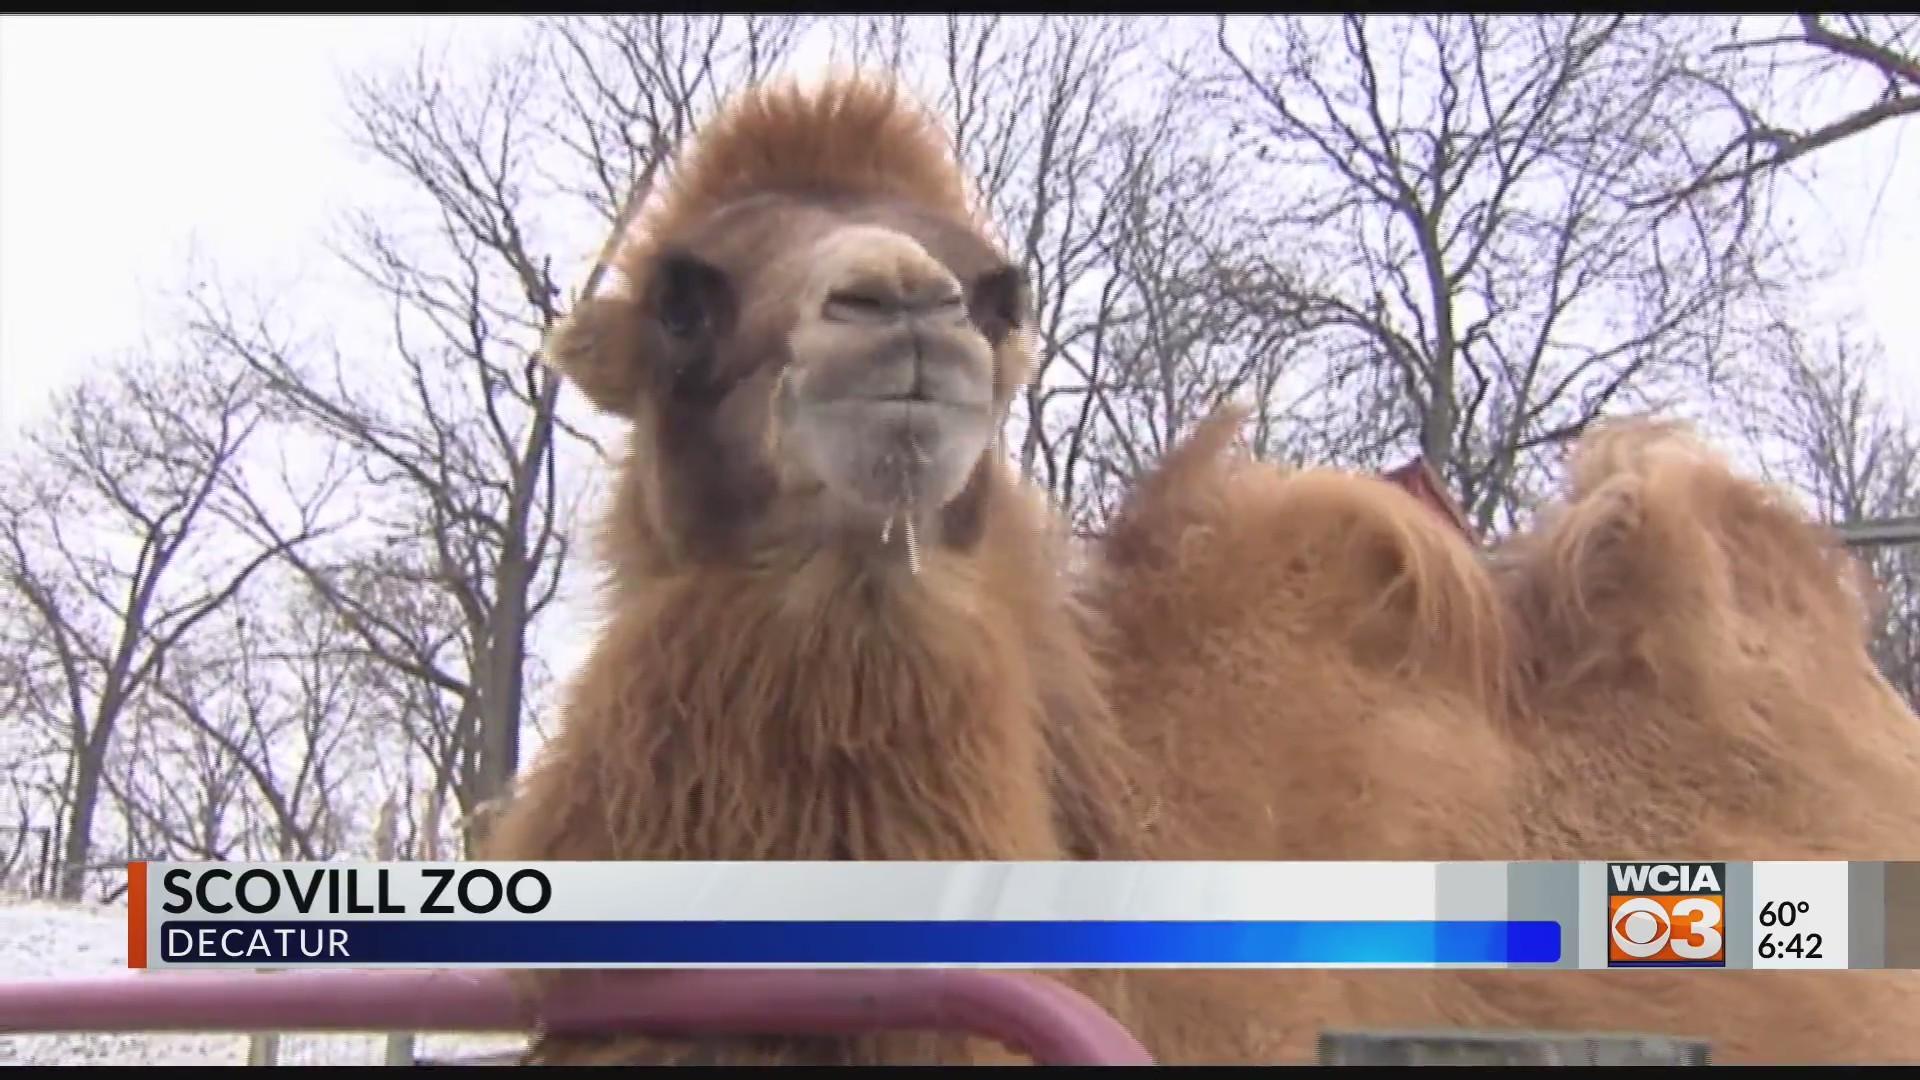 Scoville Zoo